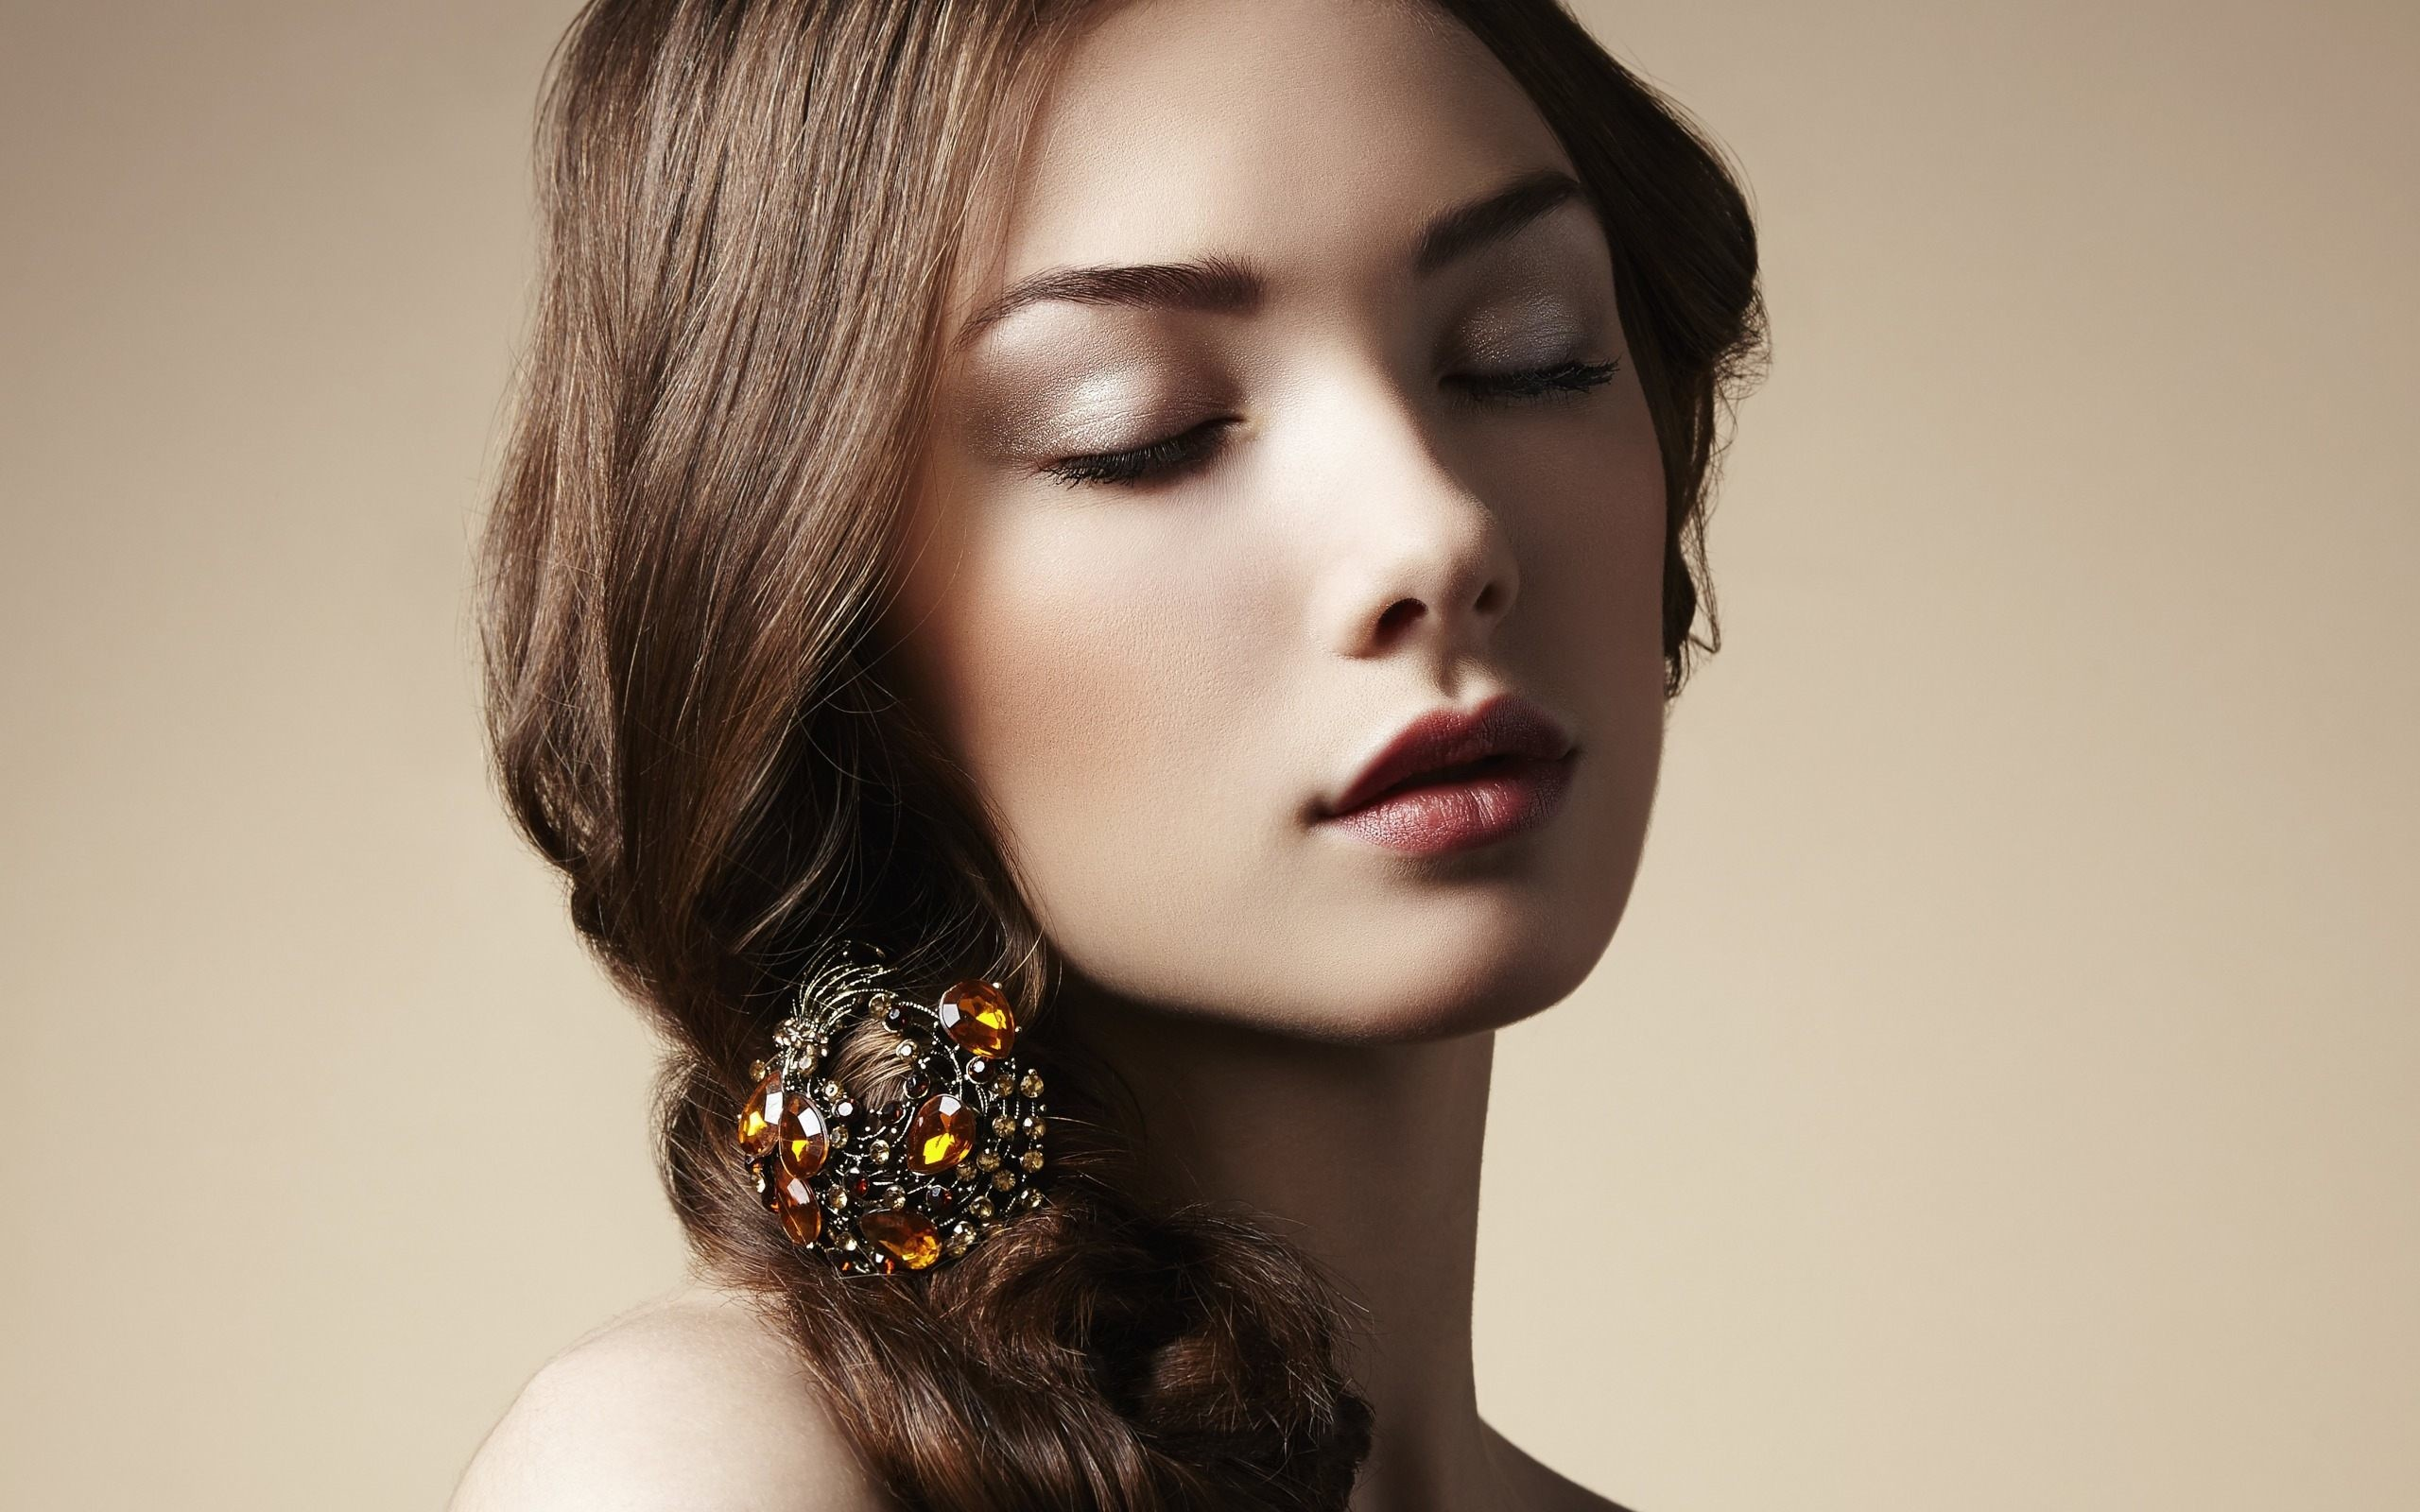 Beautiful Women Faces Wallpaper – WallpaperSafari